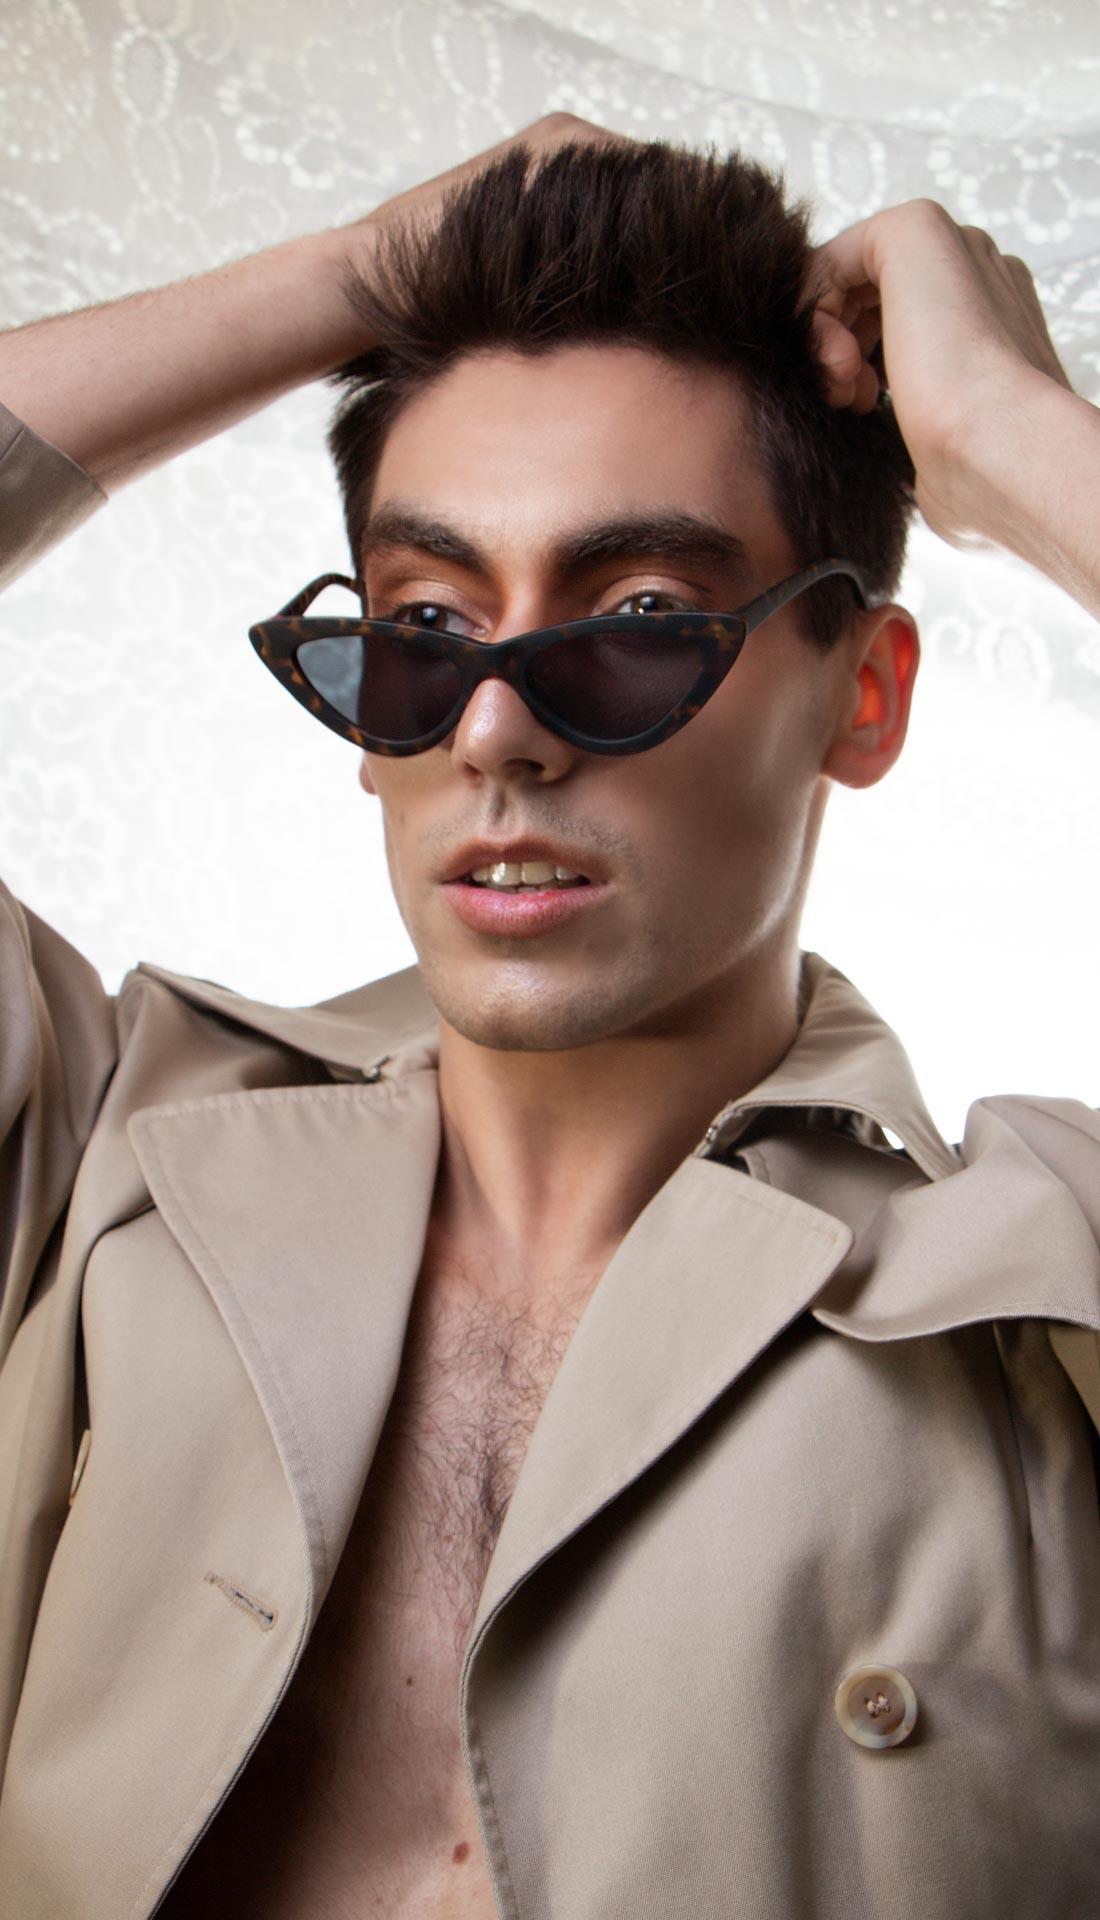 Male model posing in sunglasses. Fashion portrait, men's fashion photoshoot, commercial sunglasses photoshoot, commercial and fashion photographer Birmingham